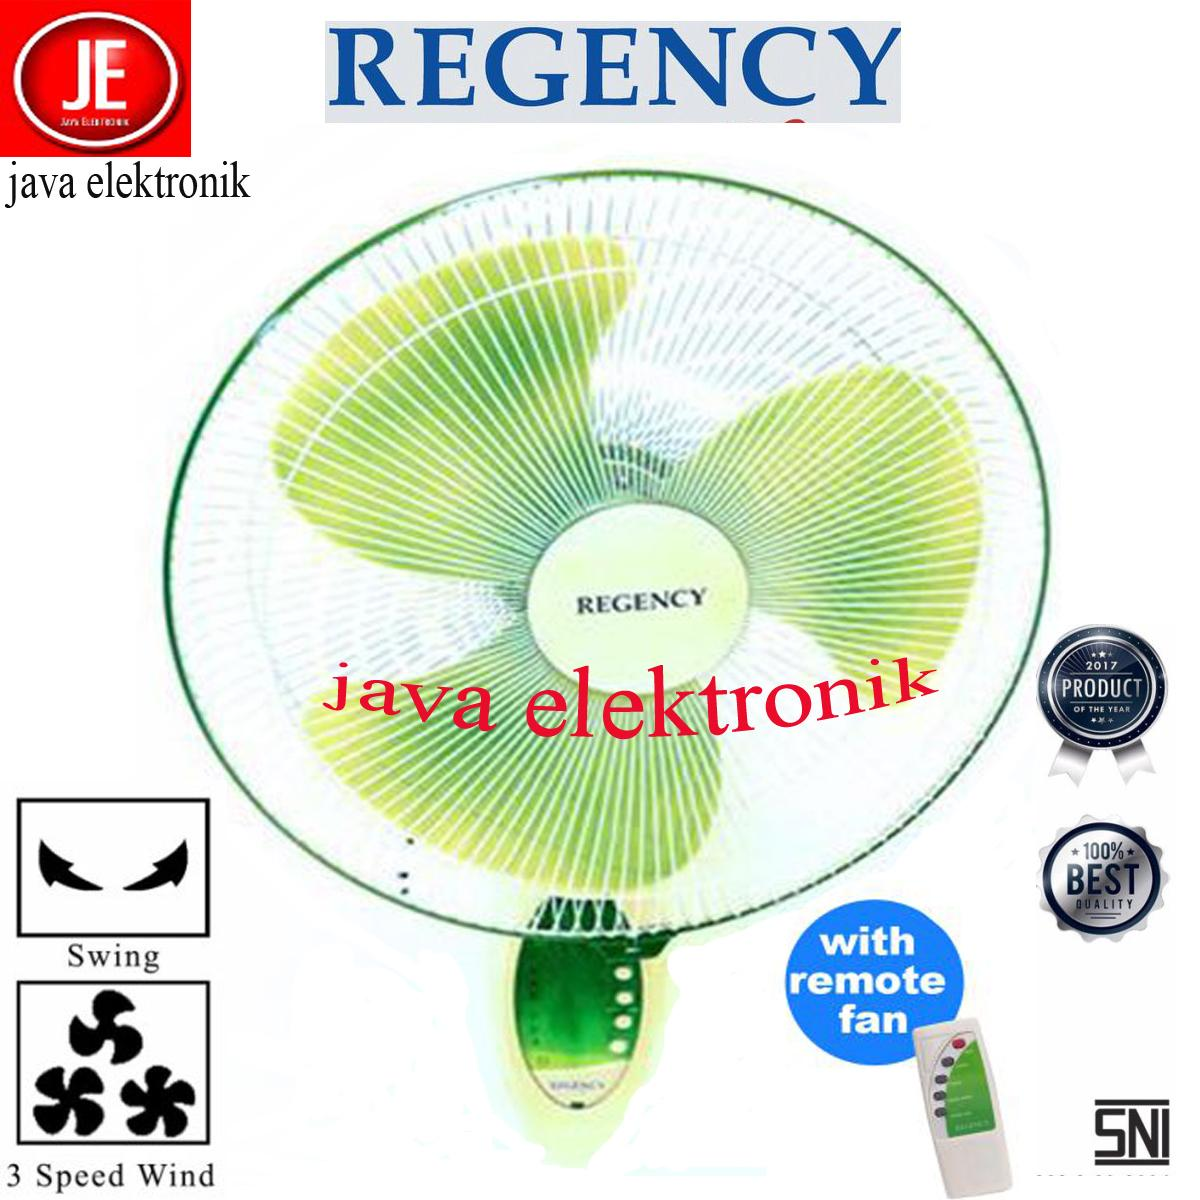 REGENCY Kipas Angin Dinding Wall Electric Fan Remote ZWFR-16 garansi resmi